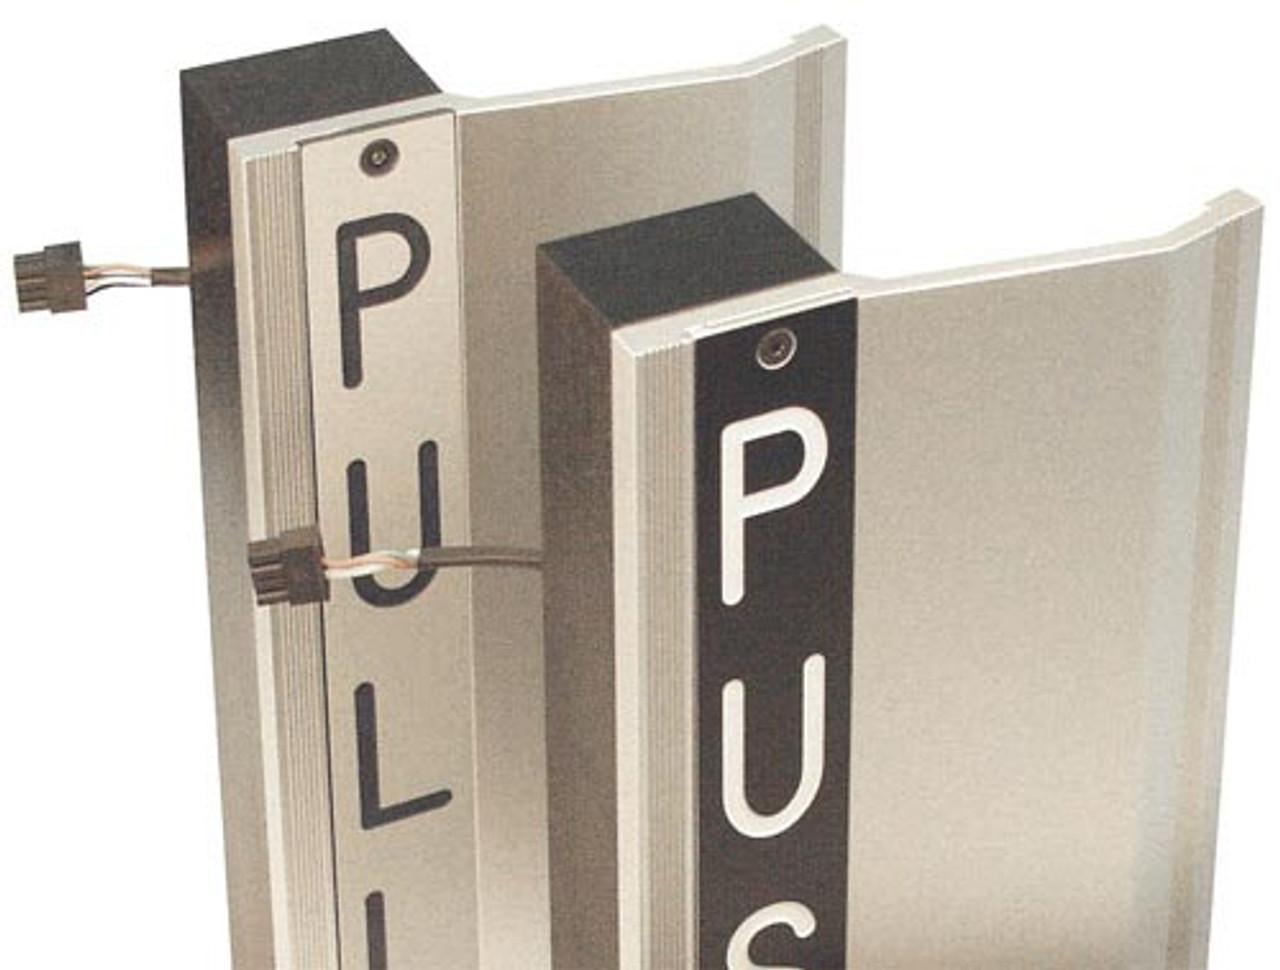 EL-TSH-BK Securitron Touch Sense Handle-Push/Pull in Black Anodized Finish